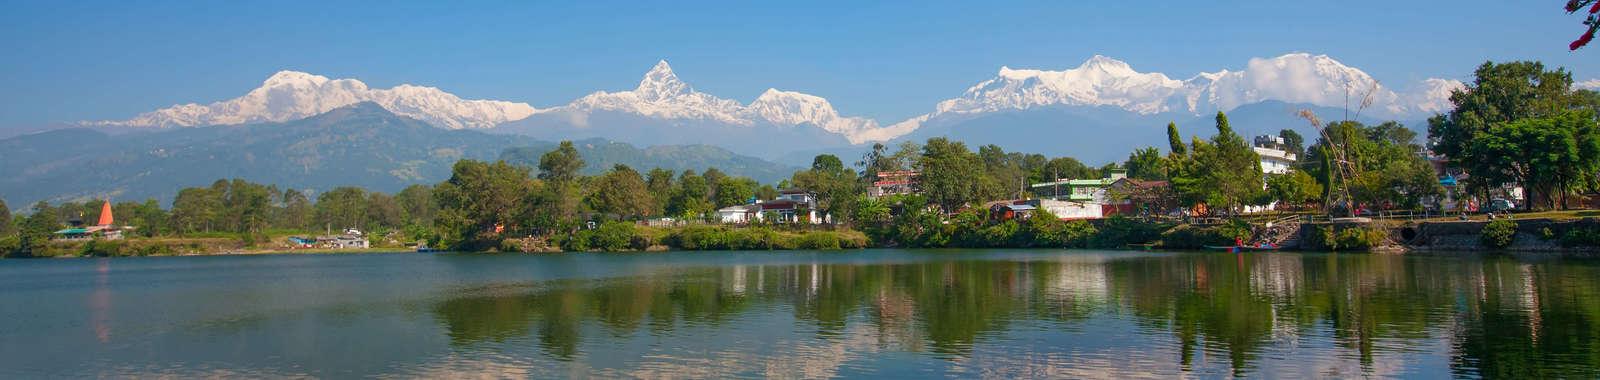 dreamstime_xxl_41959956_Pokhara_Panoramic